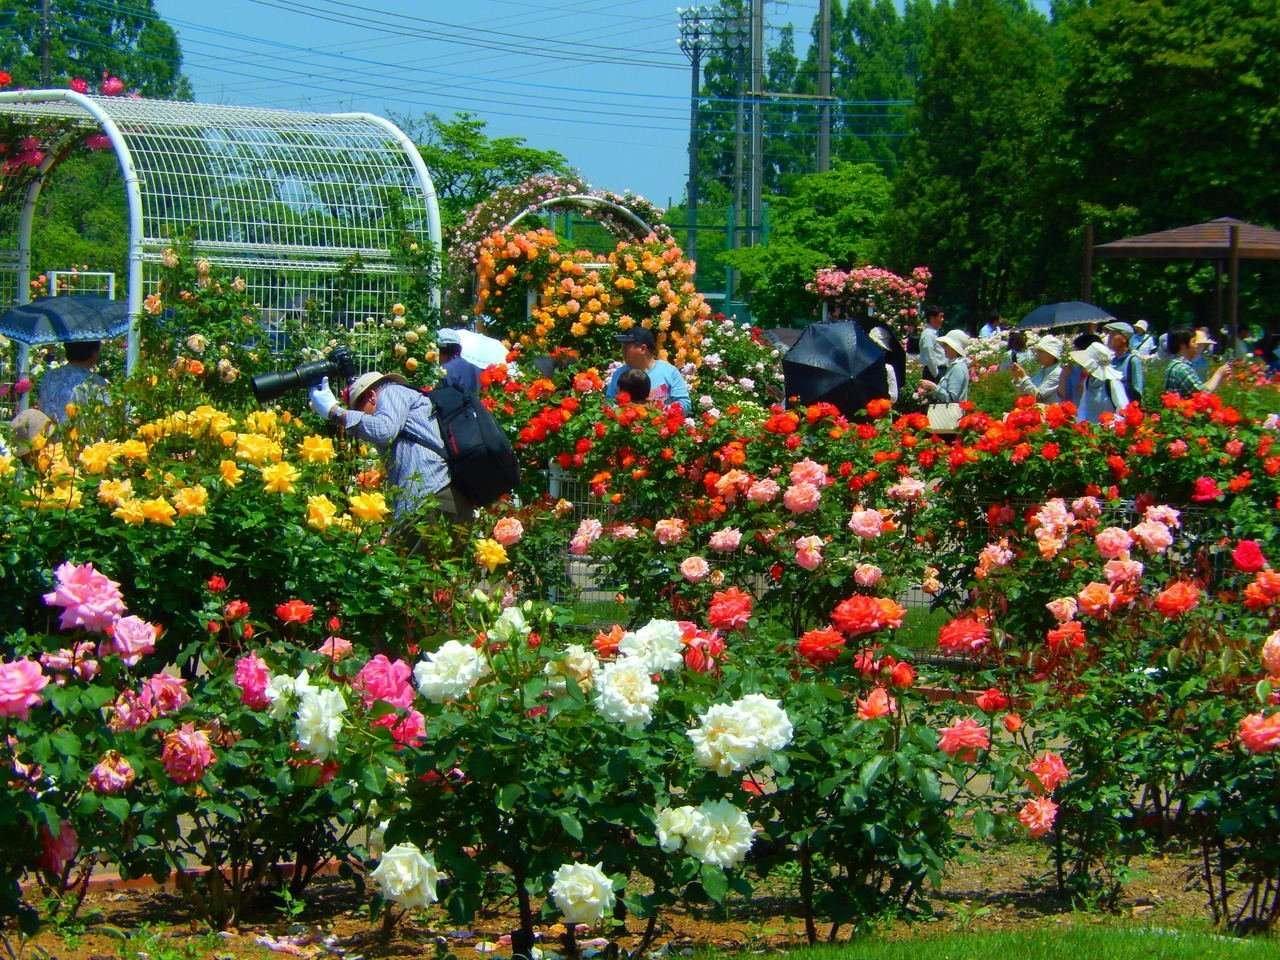 Ina rose festival